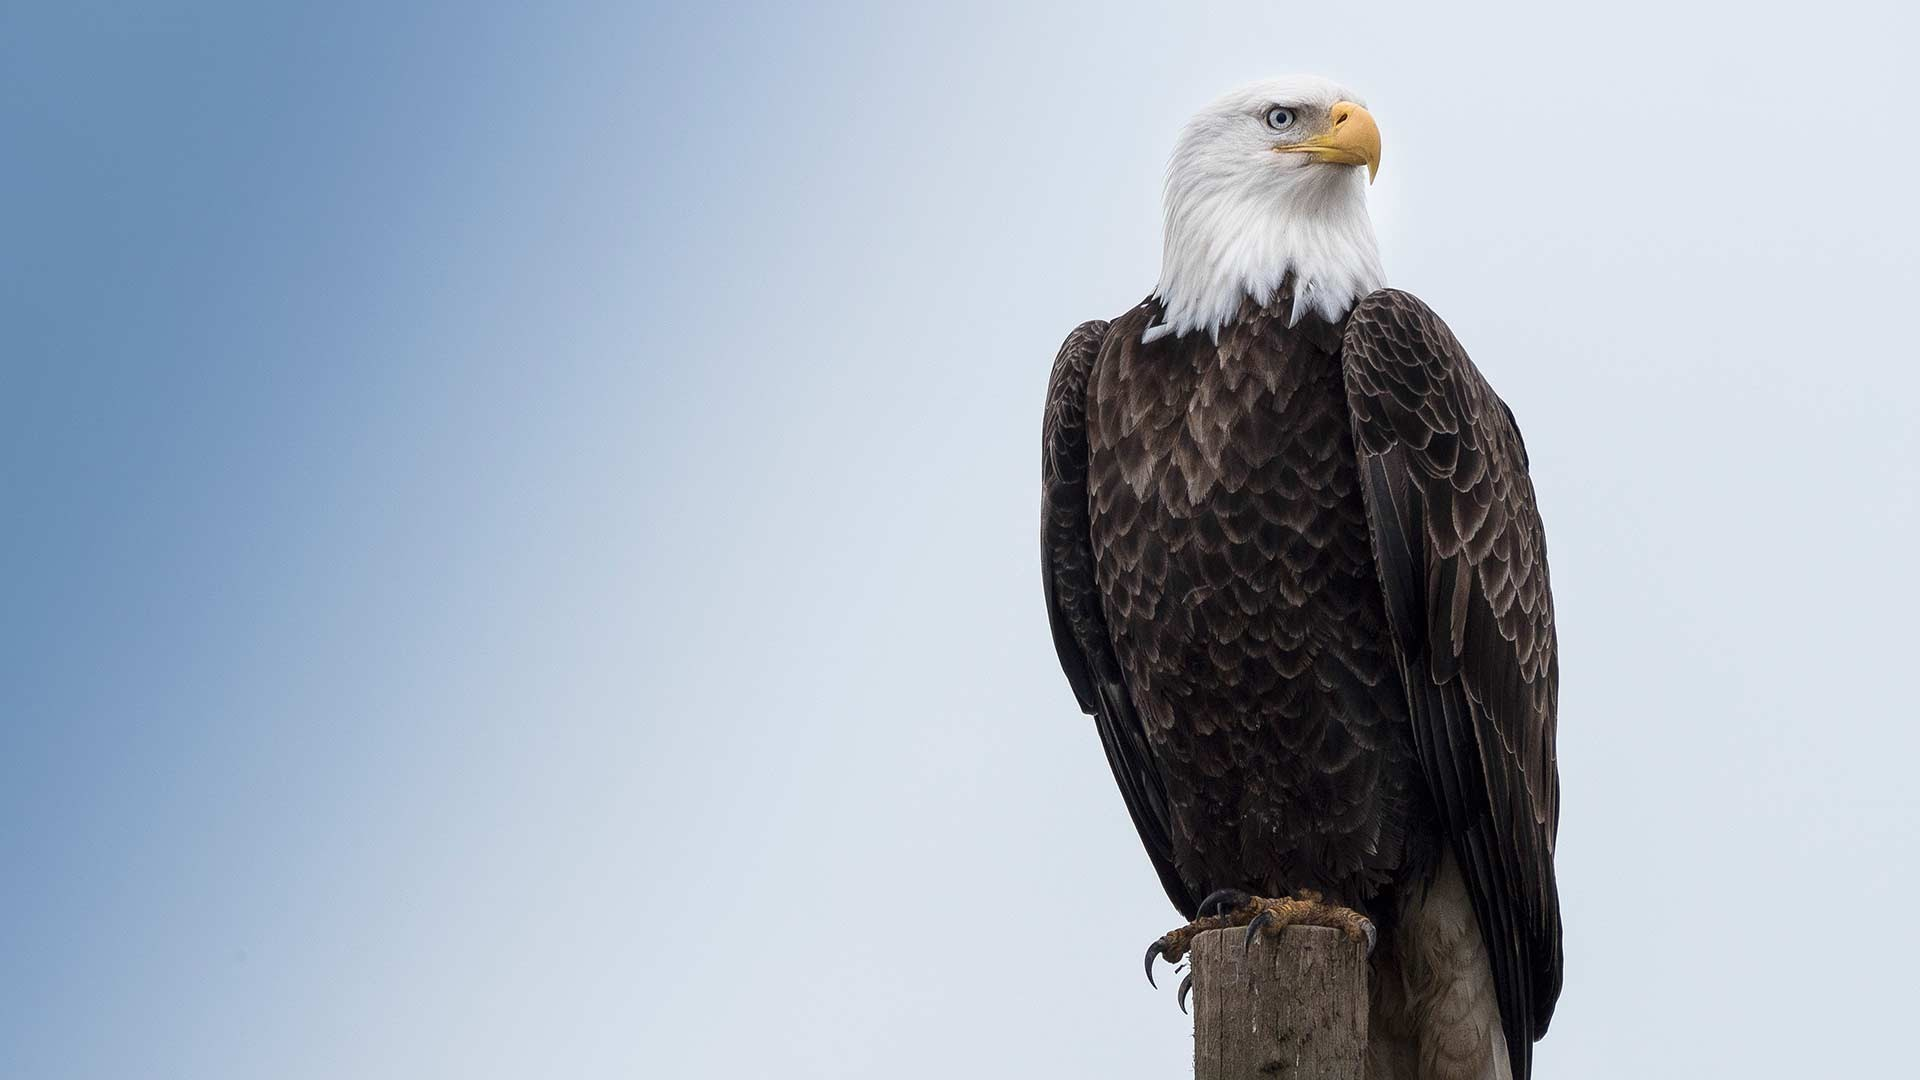 great bald eagle wallpaper